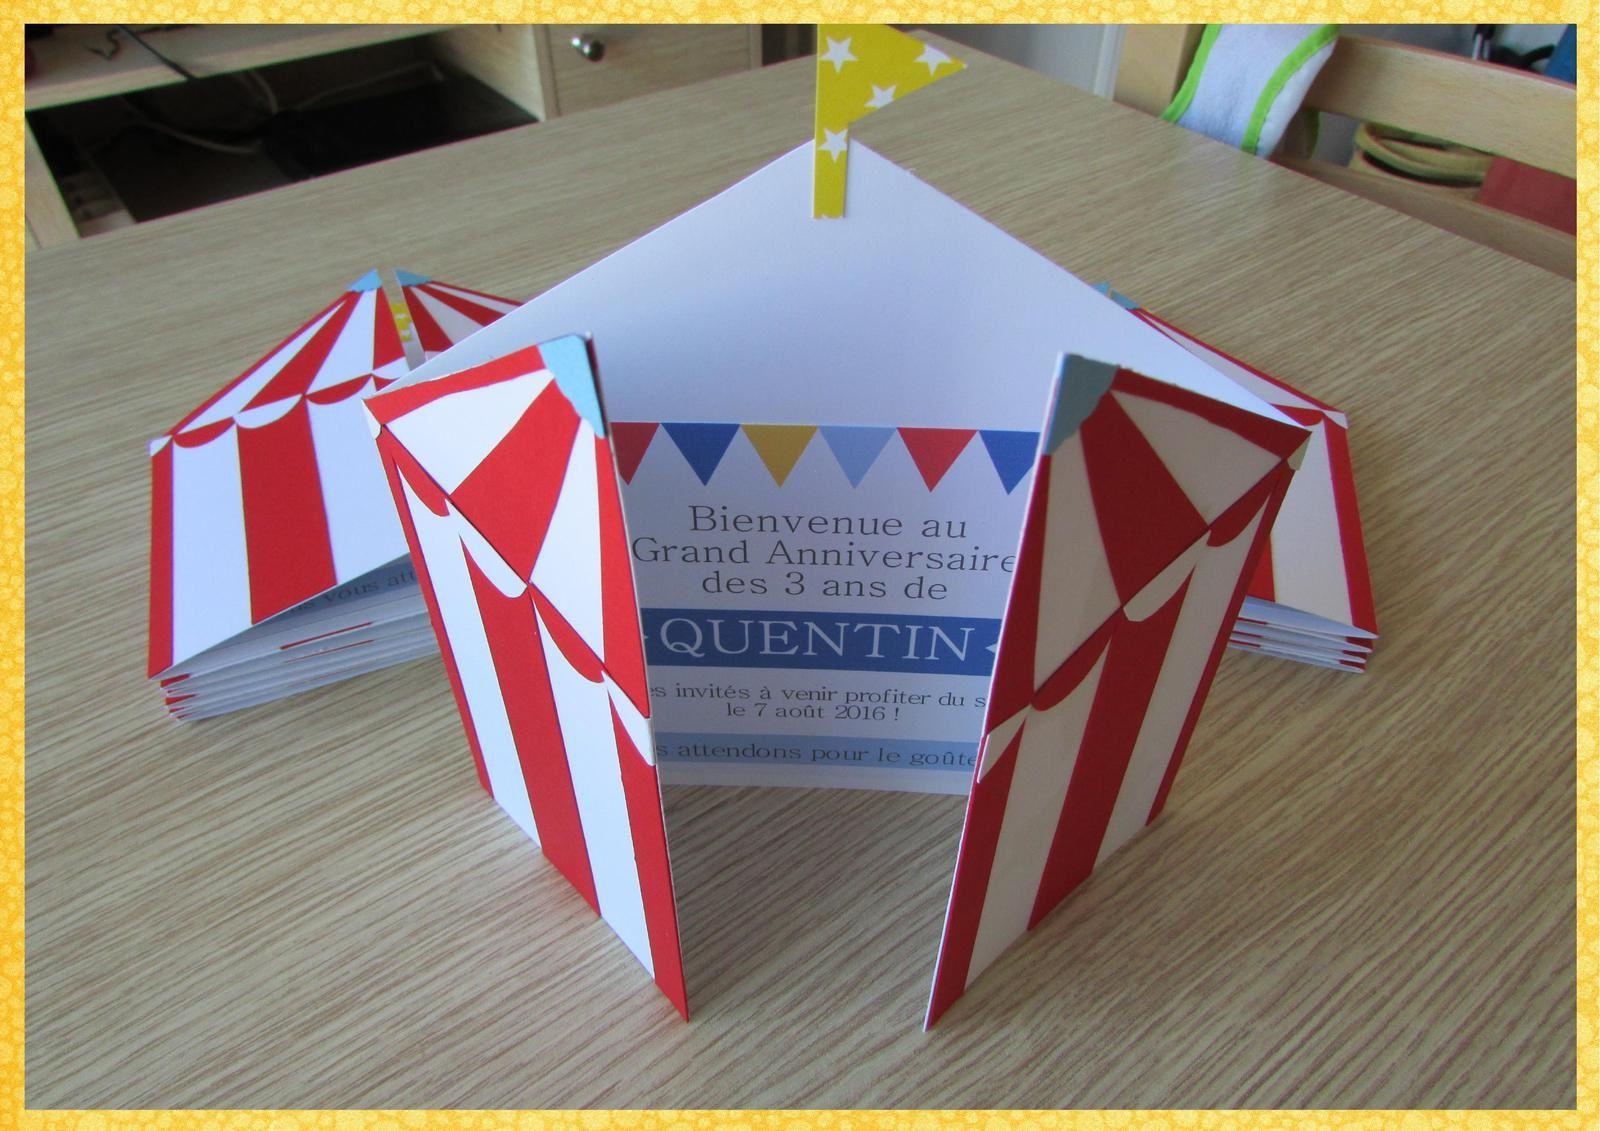 Carte d'invitation anniversaire Quentin thème cirque